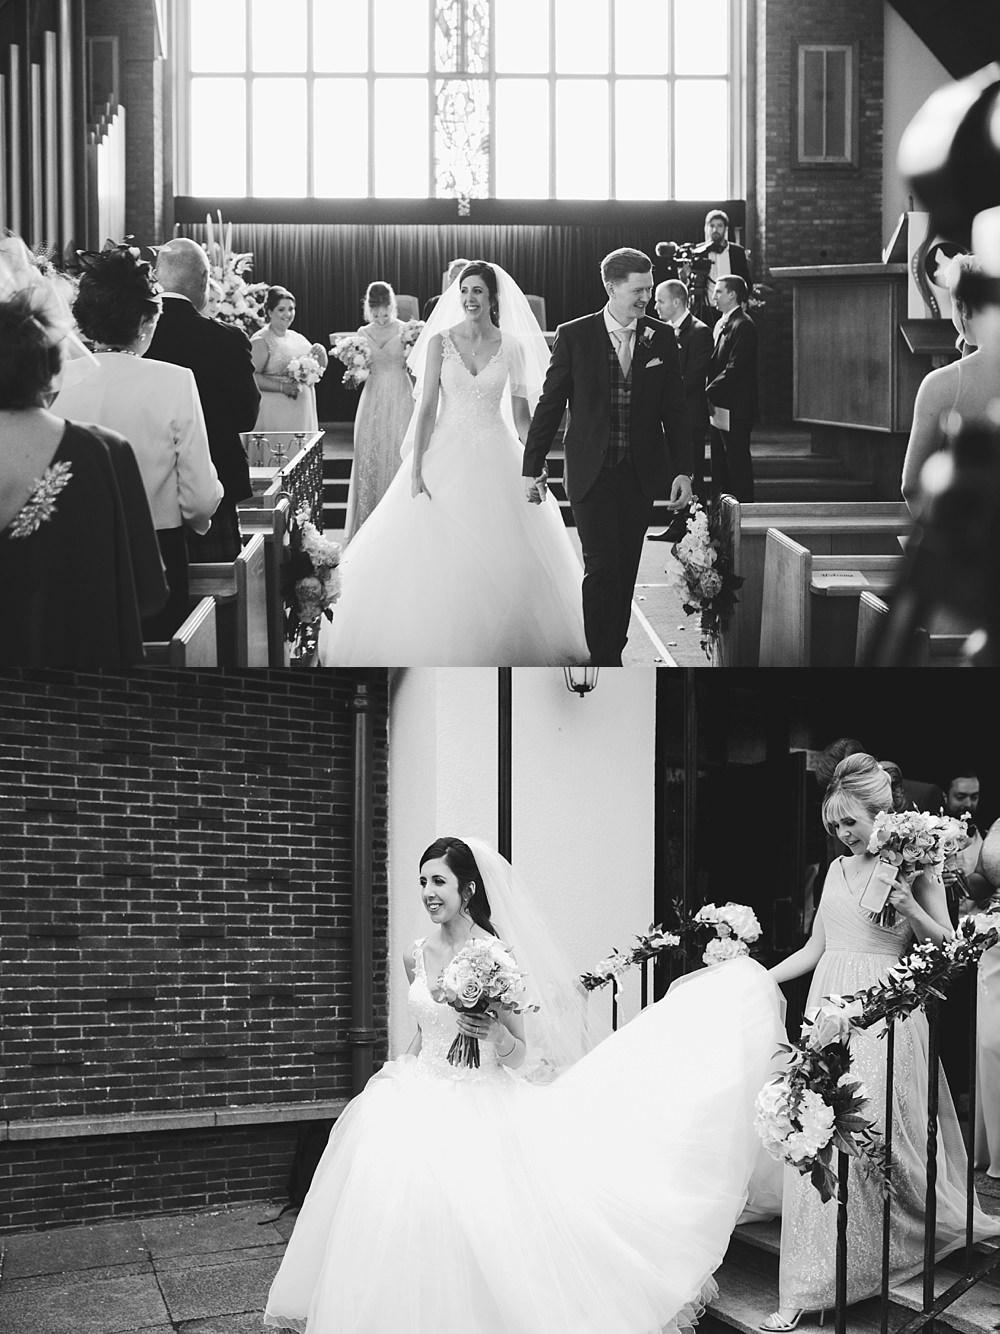 wedding-newton-mearns-glenbervie-28-56